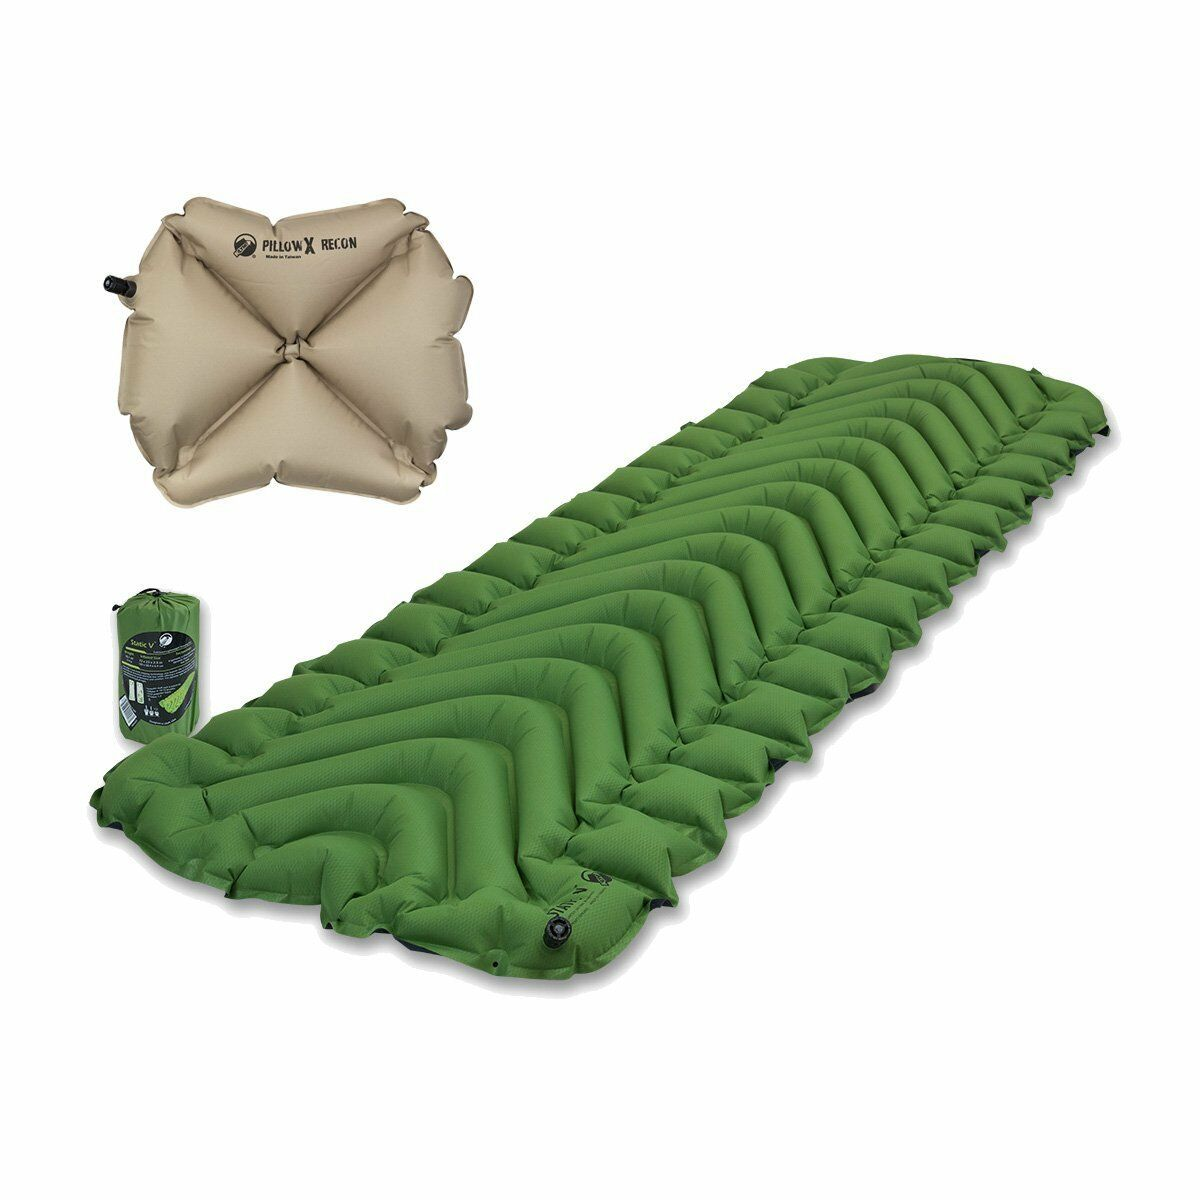 Klymit Cush Recon Seat Pillow Camping